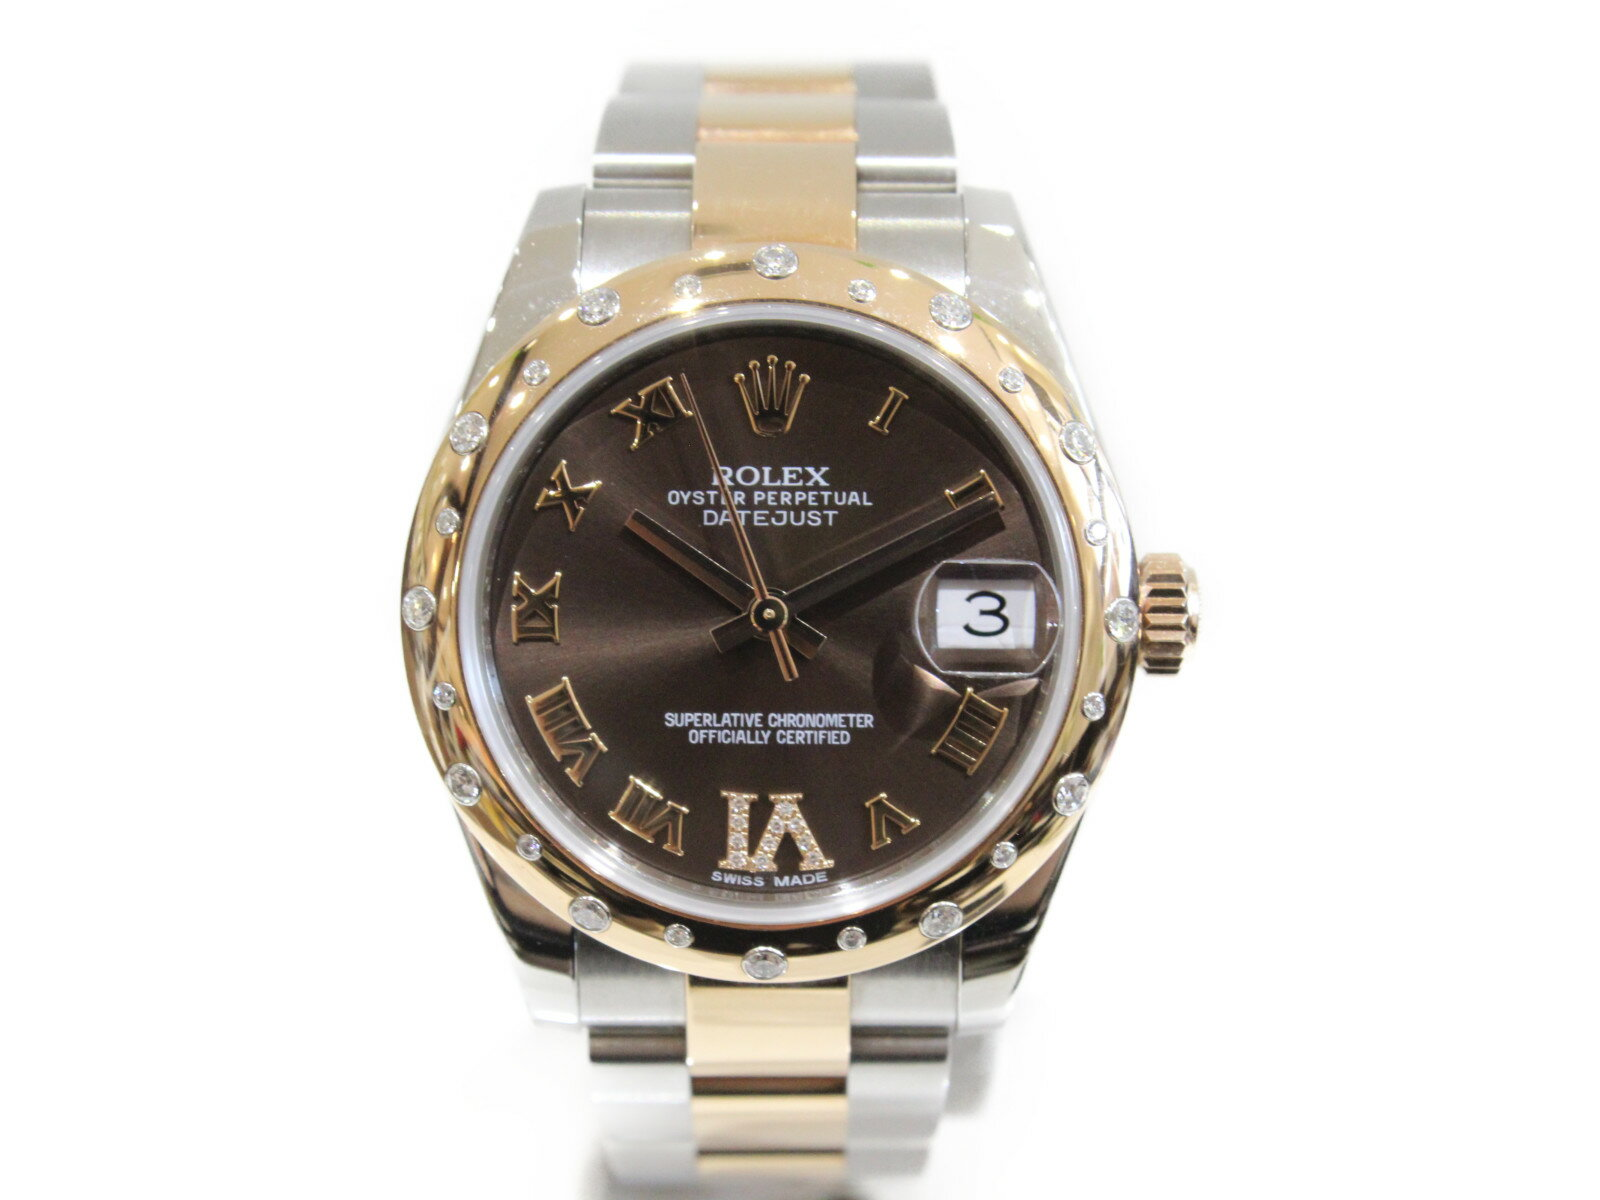 ROLEX ロレックス デイトジャスト31 178341 2015年製 31mm ピンクゴールド ダイヤ入り 自動巻き ボーイズ レディース 腕時計【中古】